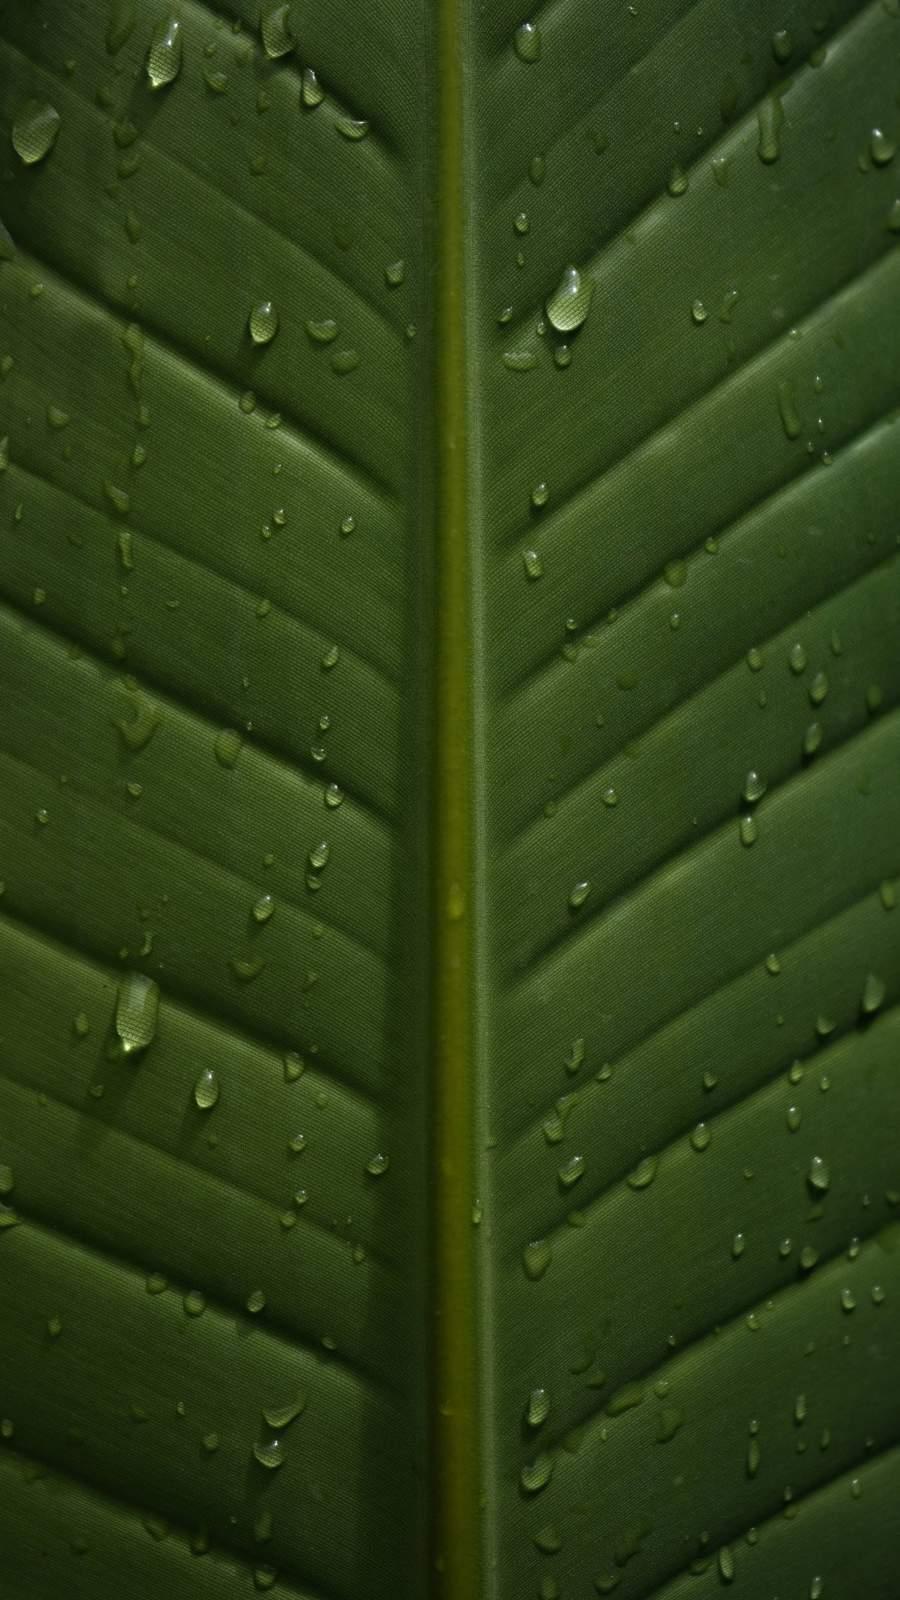 Raindrops On Leaf iPhone Wallpaper